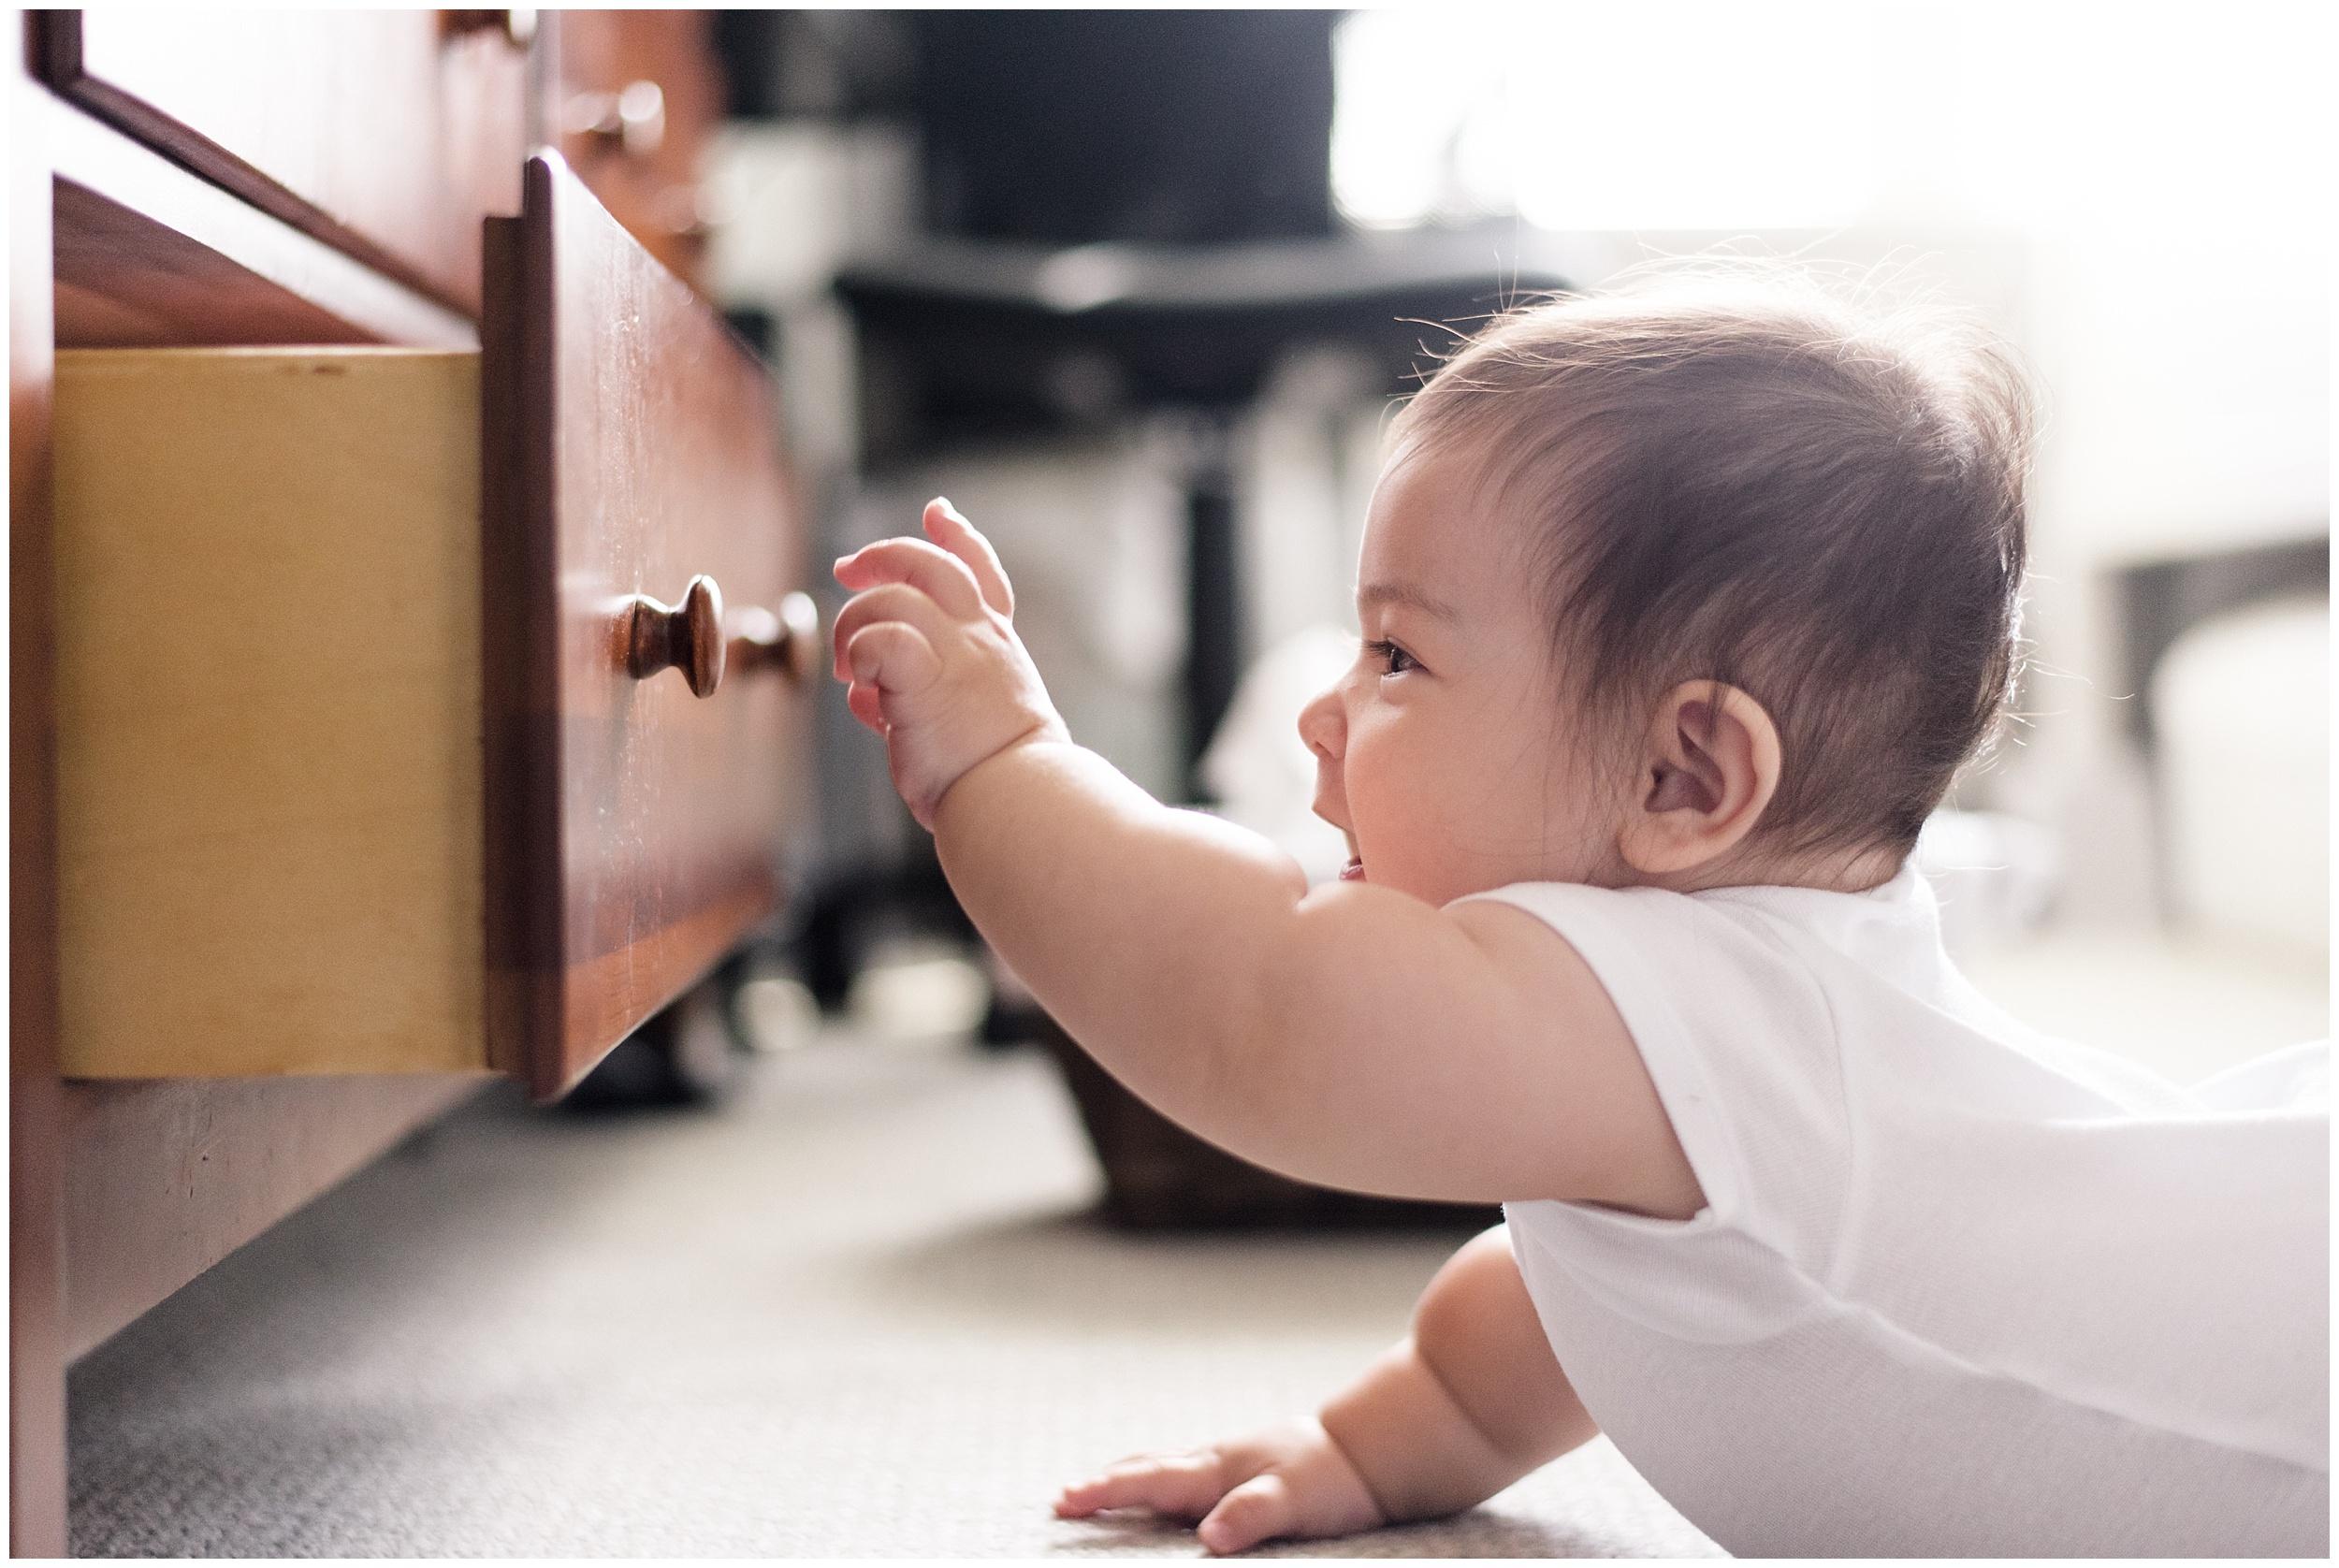 milwaukee-mom-photographer-9-month-old-photography_0001.jpg